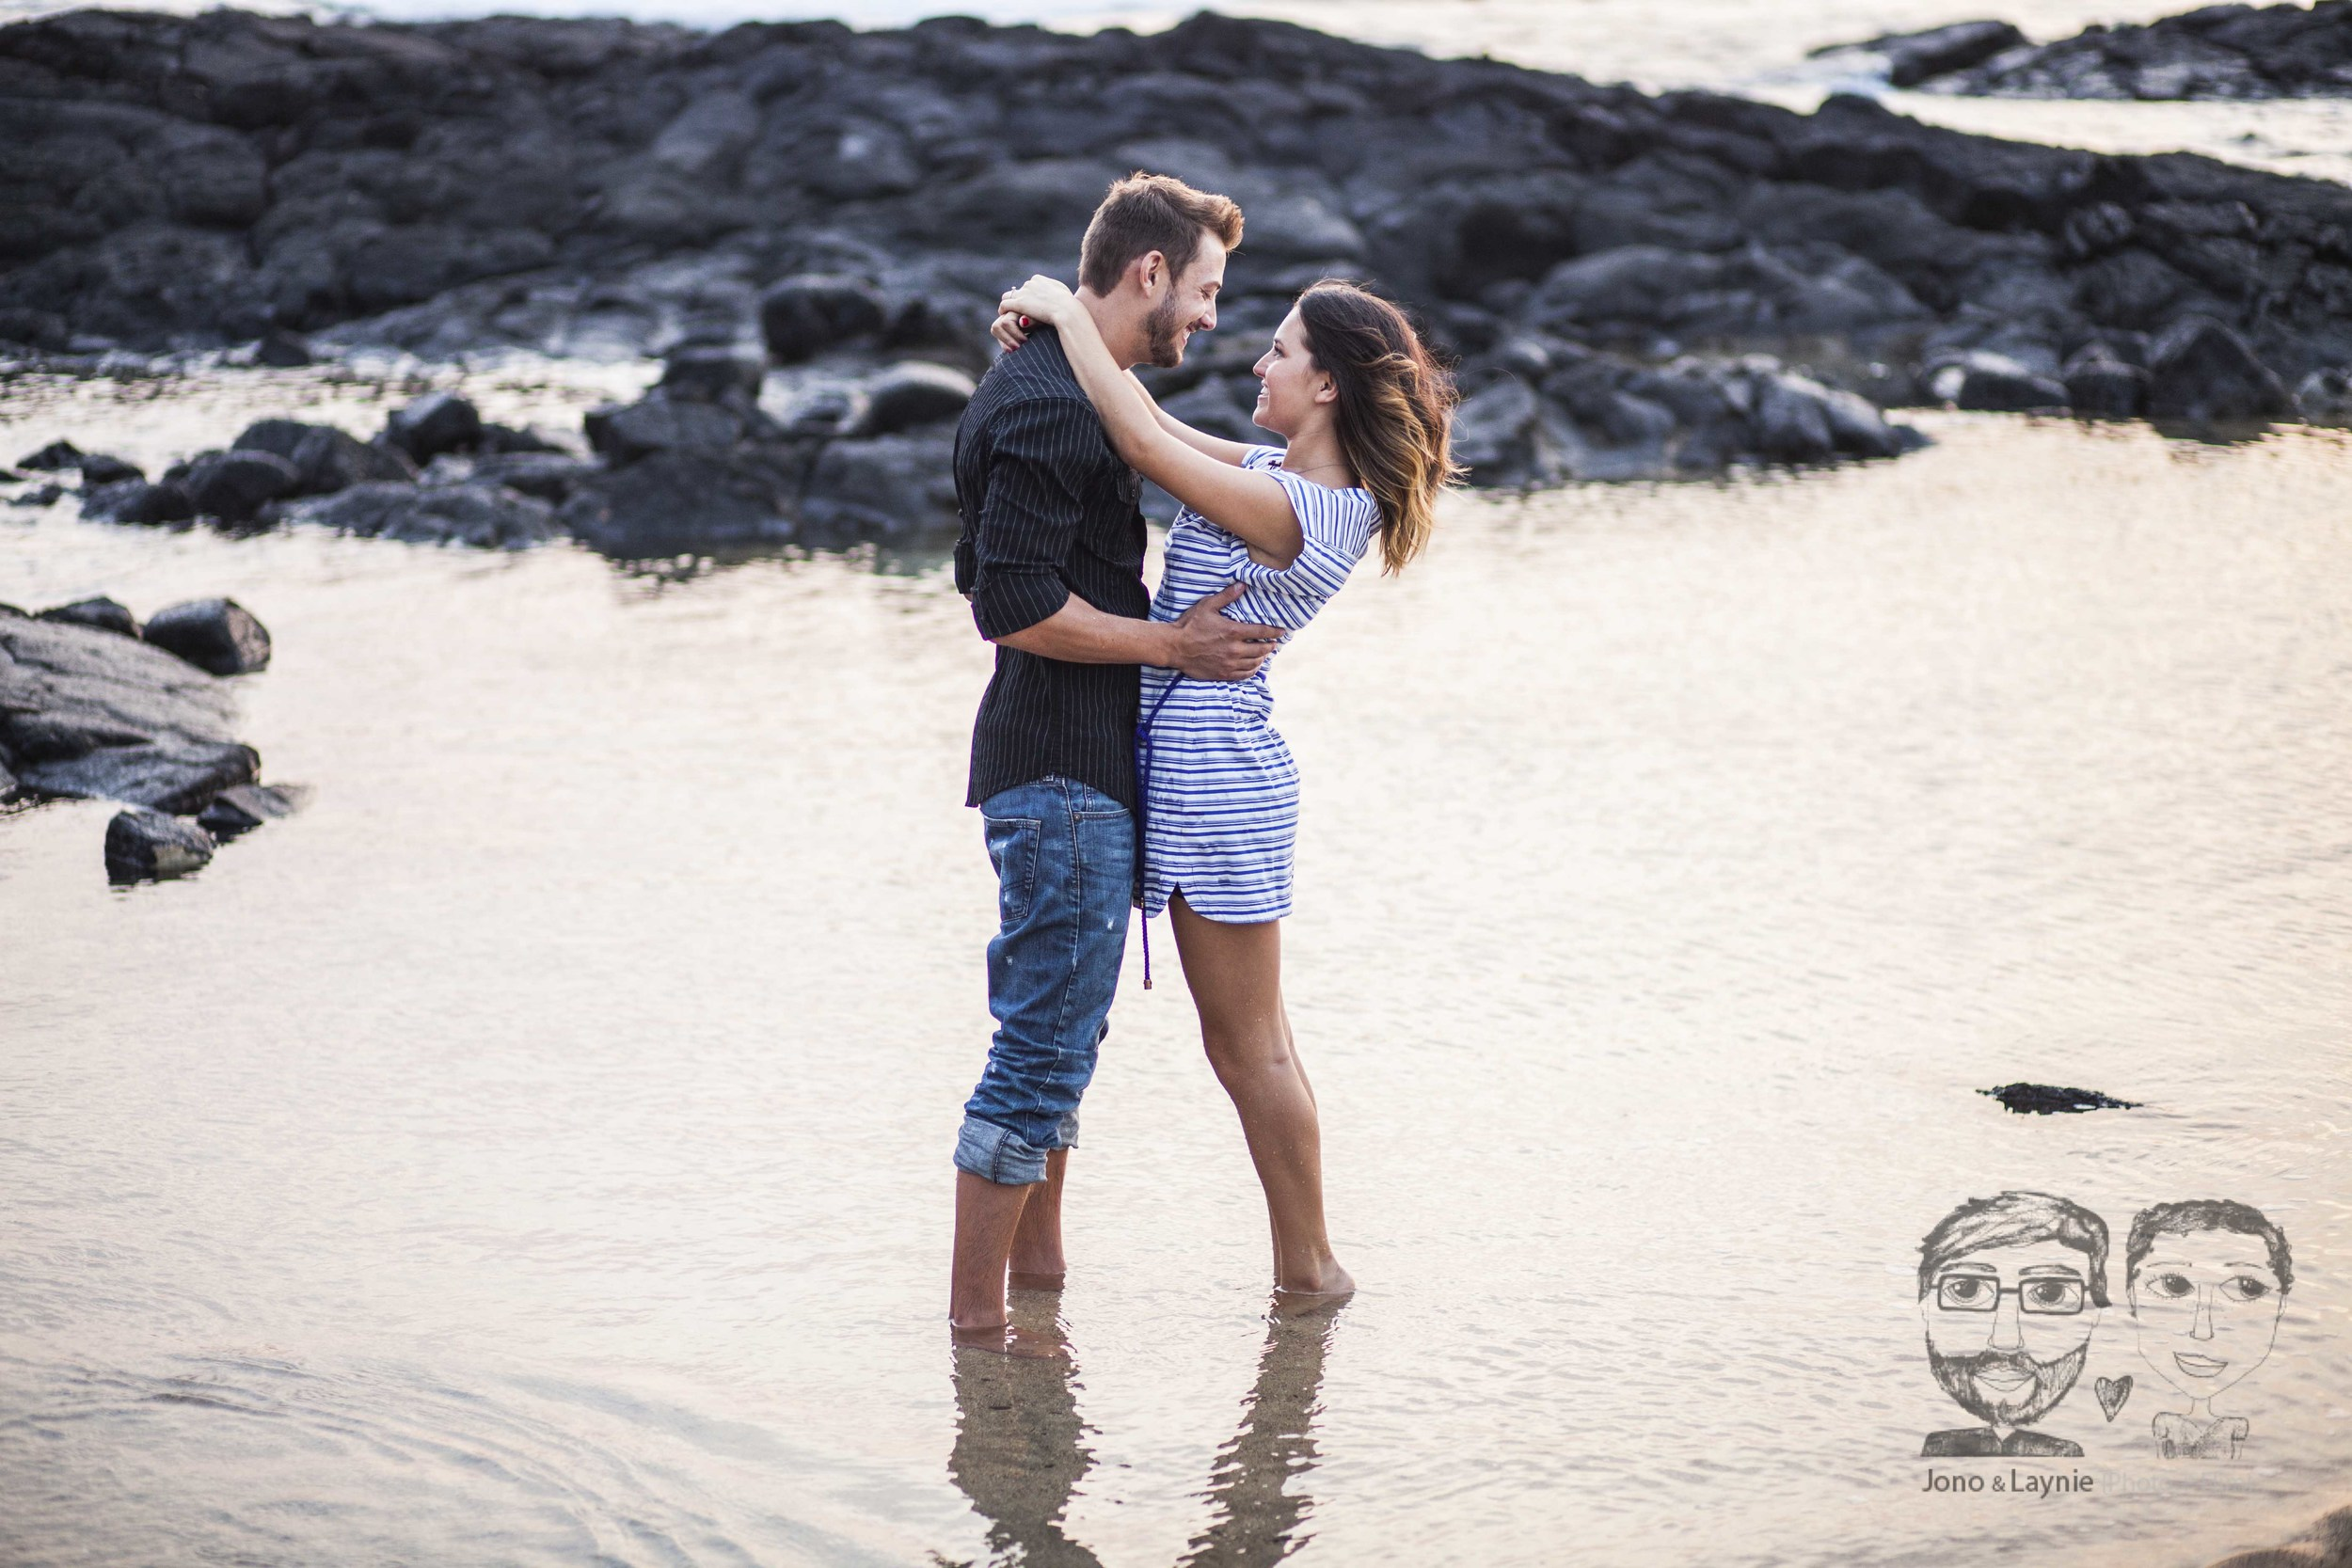 Jono & Laynie Co.-Kona, Hawaii-Engagement Session40.jpg